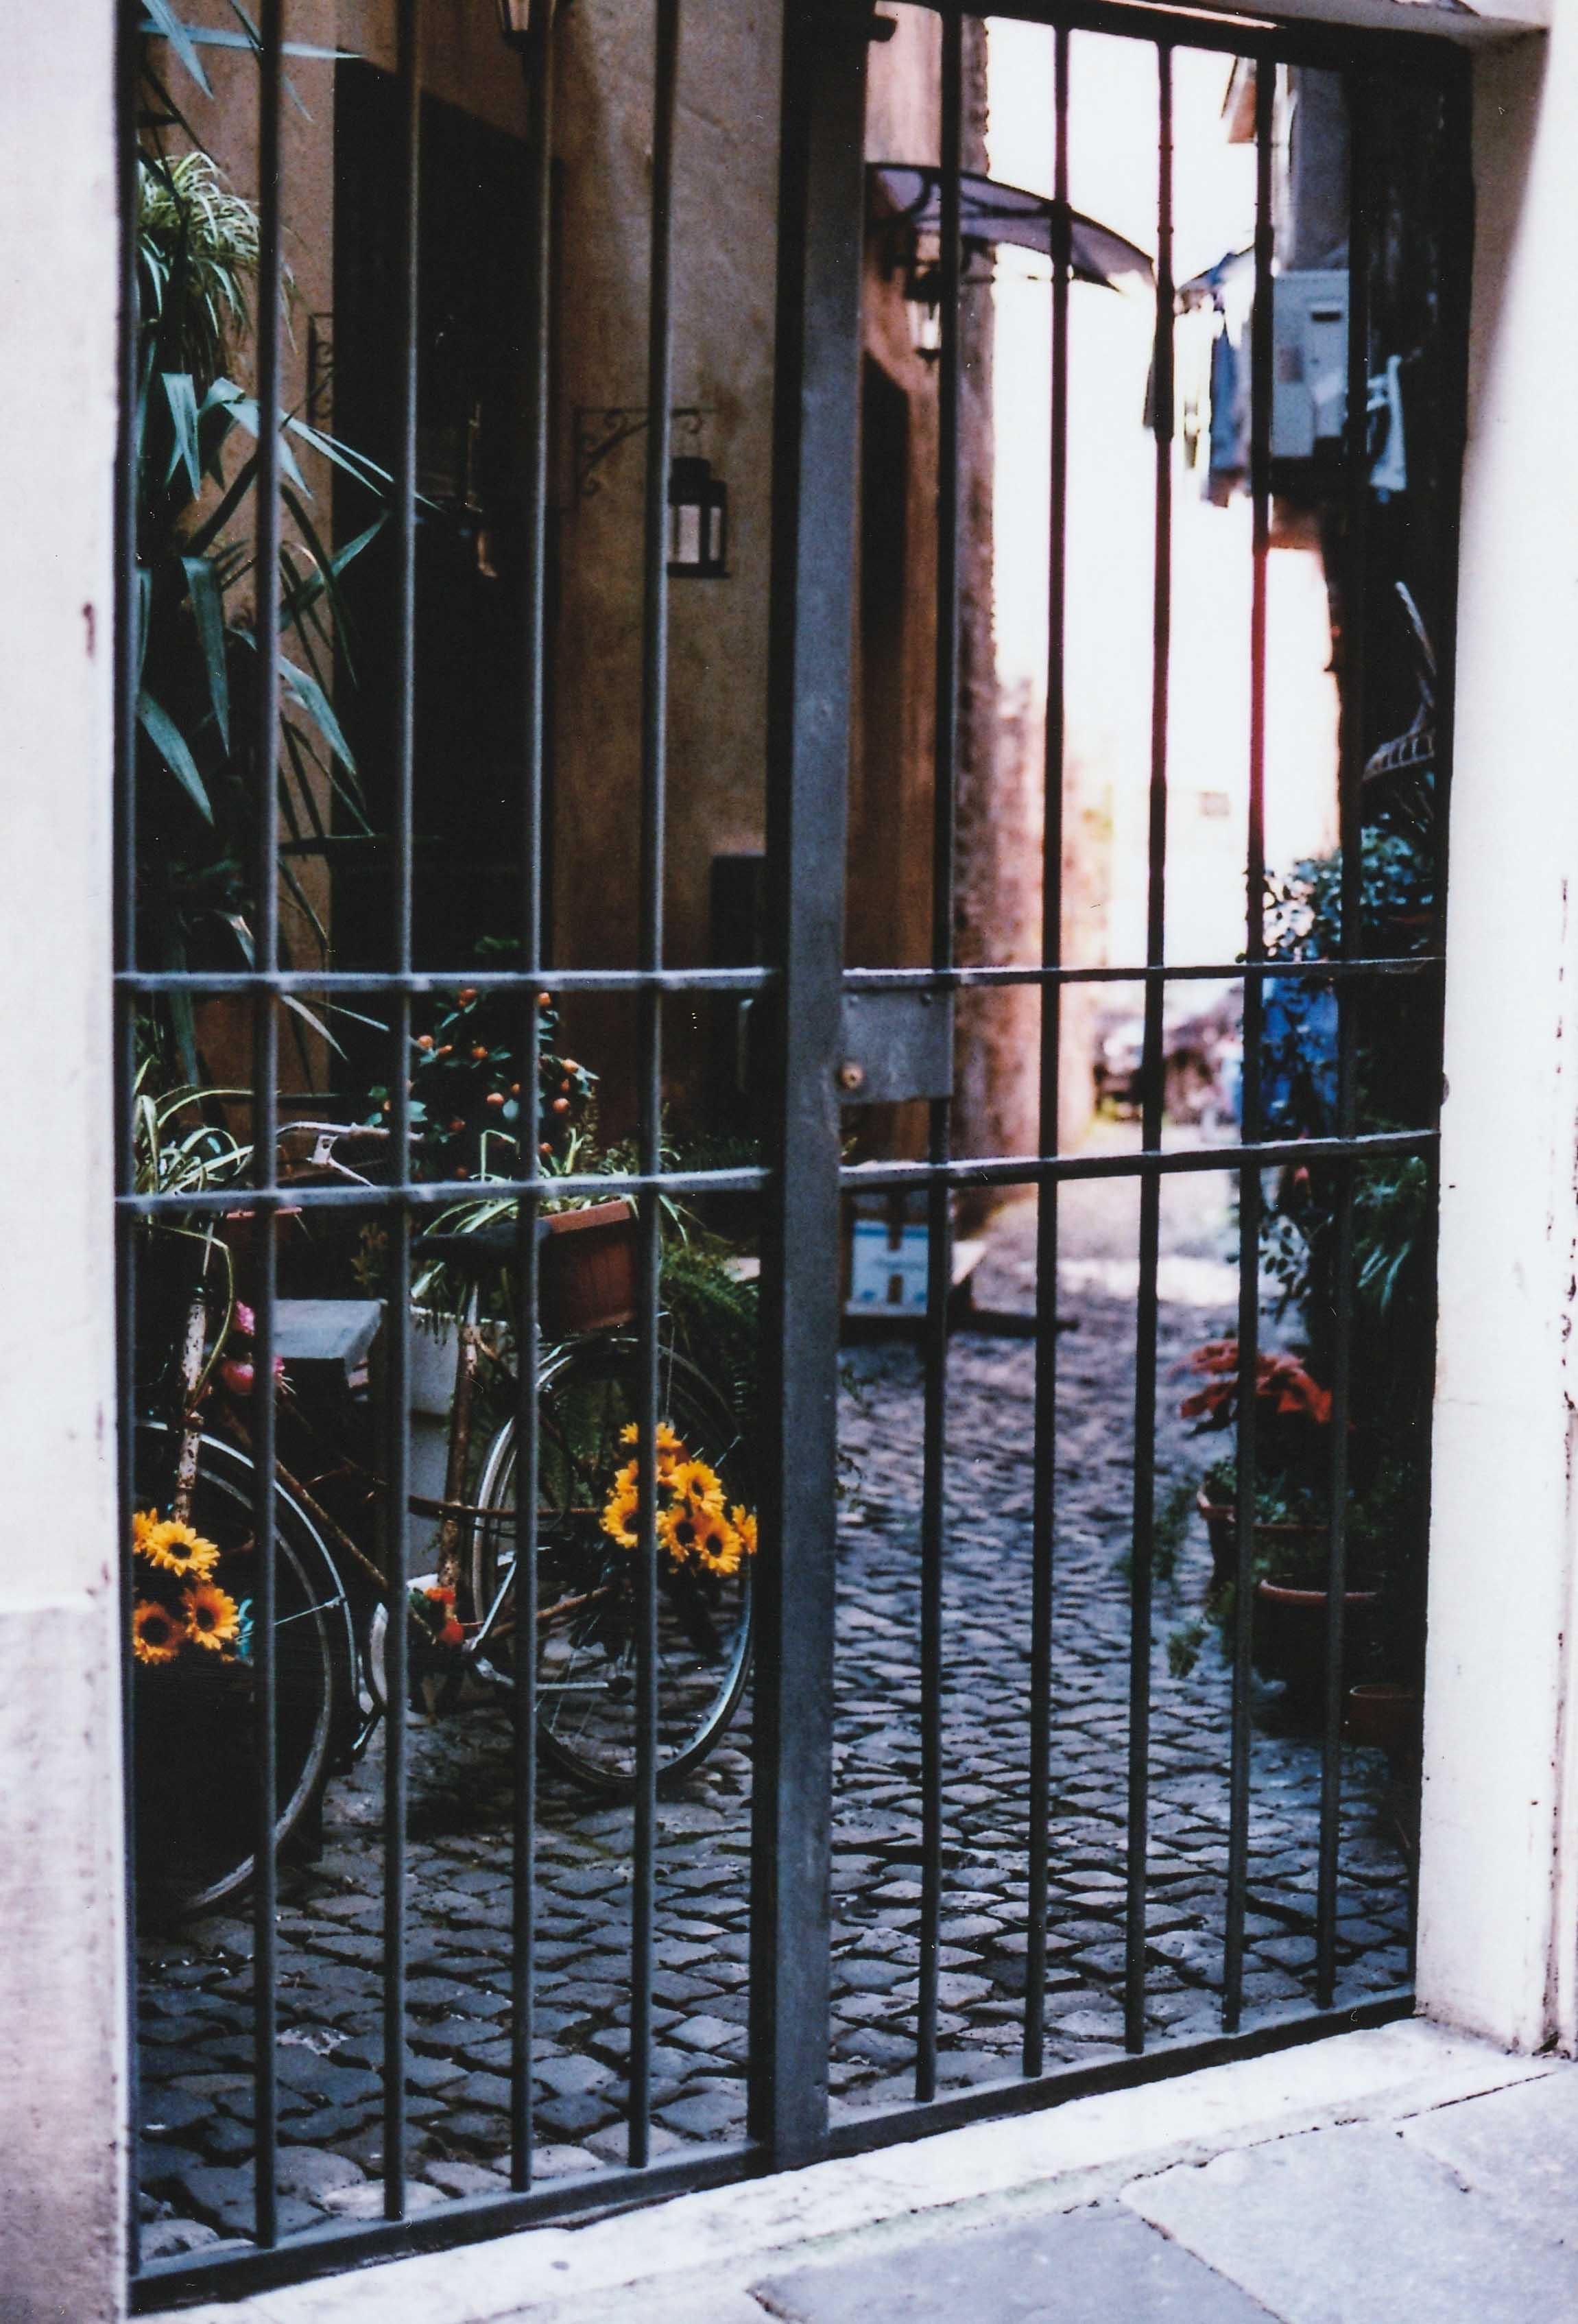 © Deborah D'Addetta (Naples, Italy) | The void of south Italy